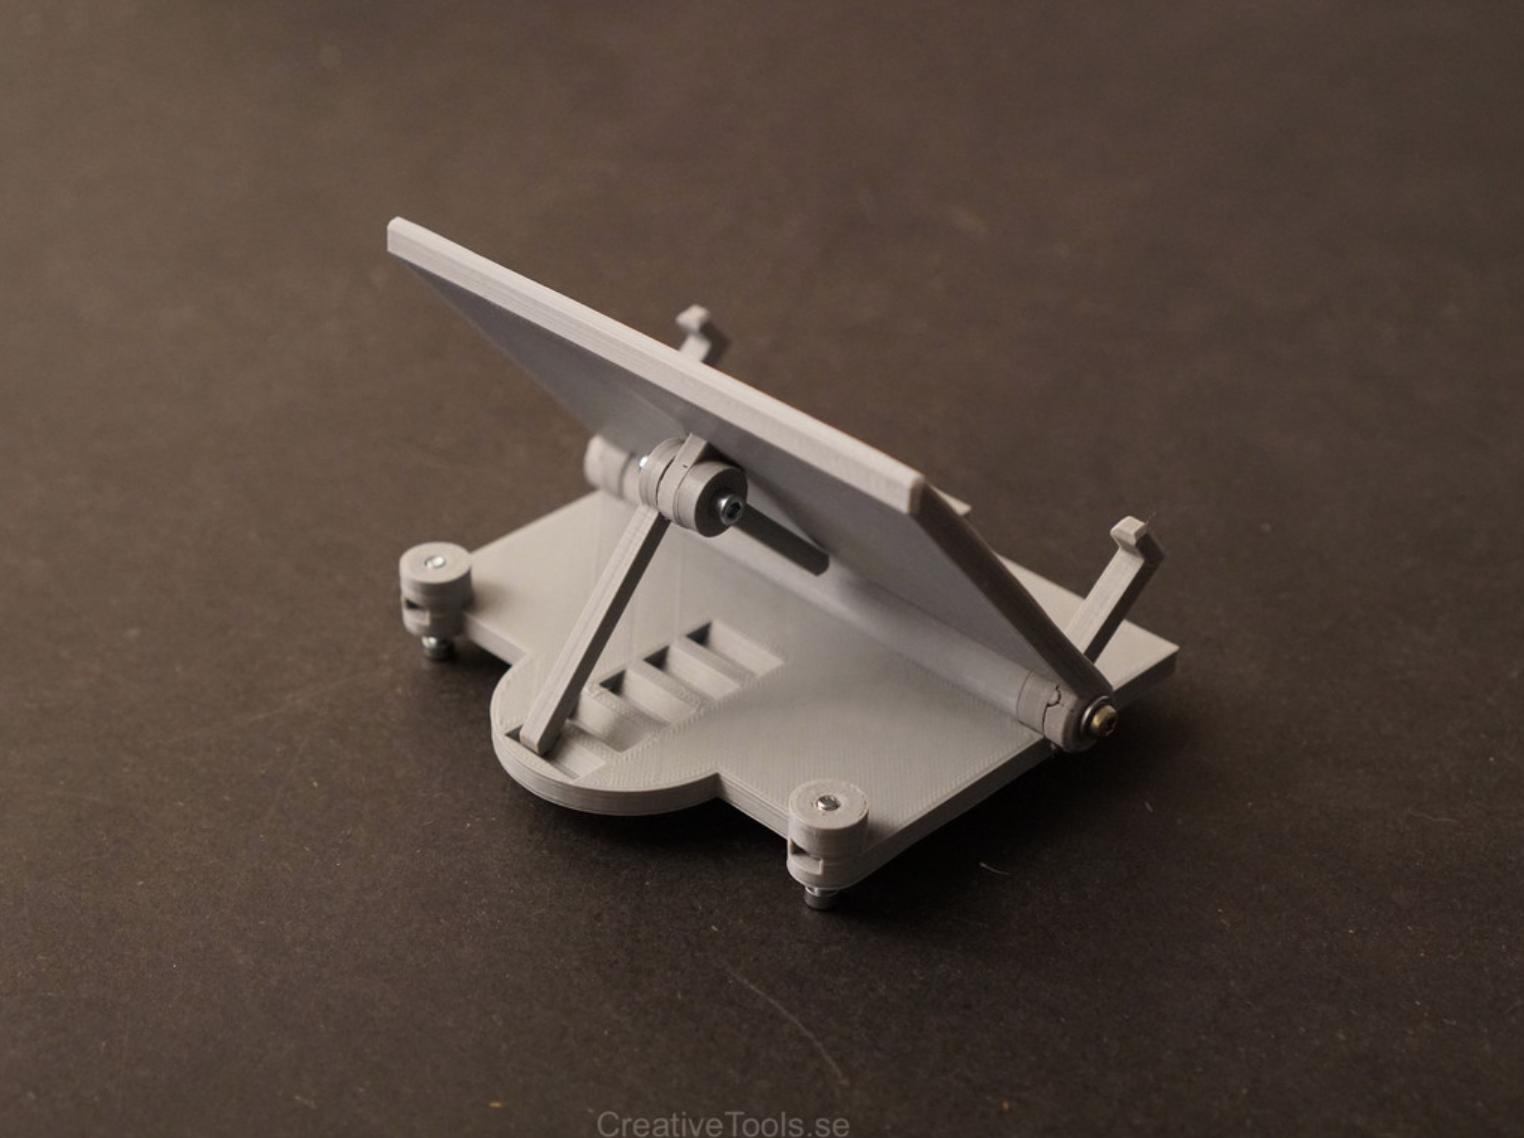 Capture d'écran 2018-01-31 à 18.05.51.png Download free STL file Smartphone Desktop Stand (adjustable angle) • 3D printer object, CreativeTools